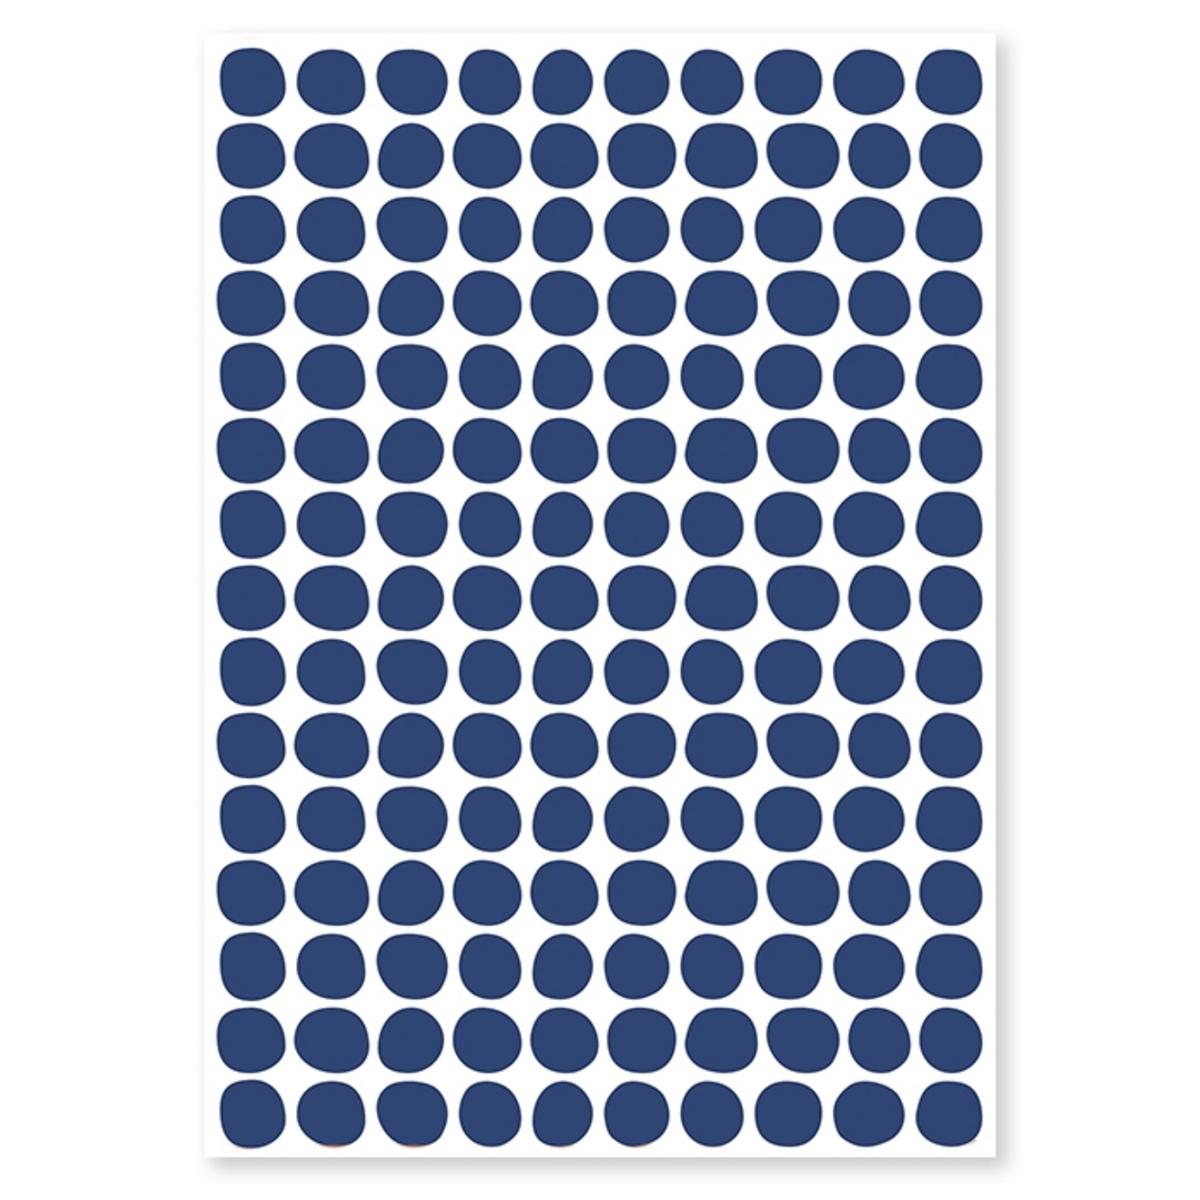 Sticker Planche de Stickers - Pois Navy Planche de Stickers - Pois Navy